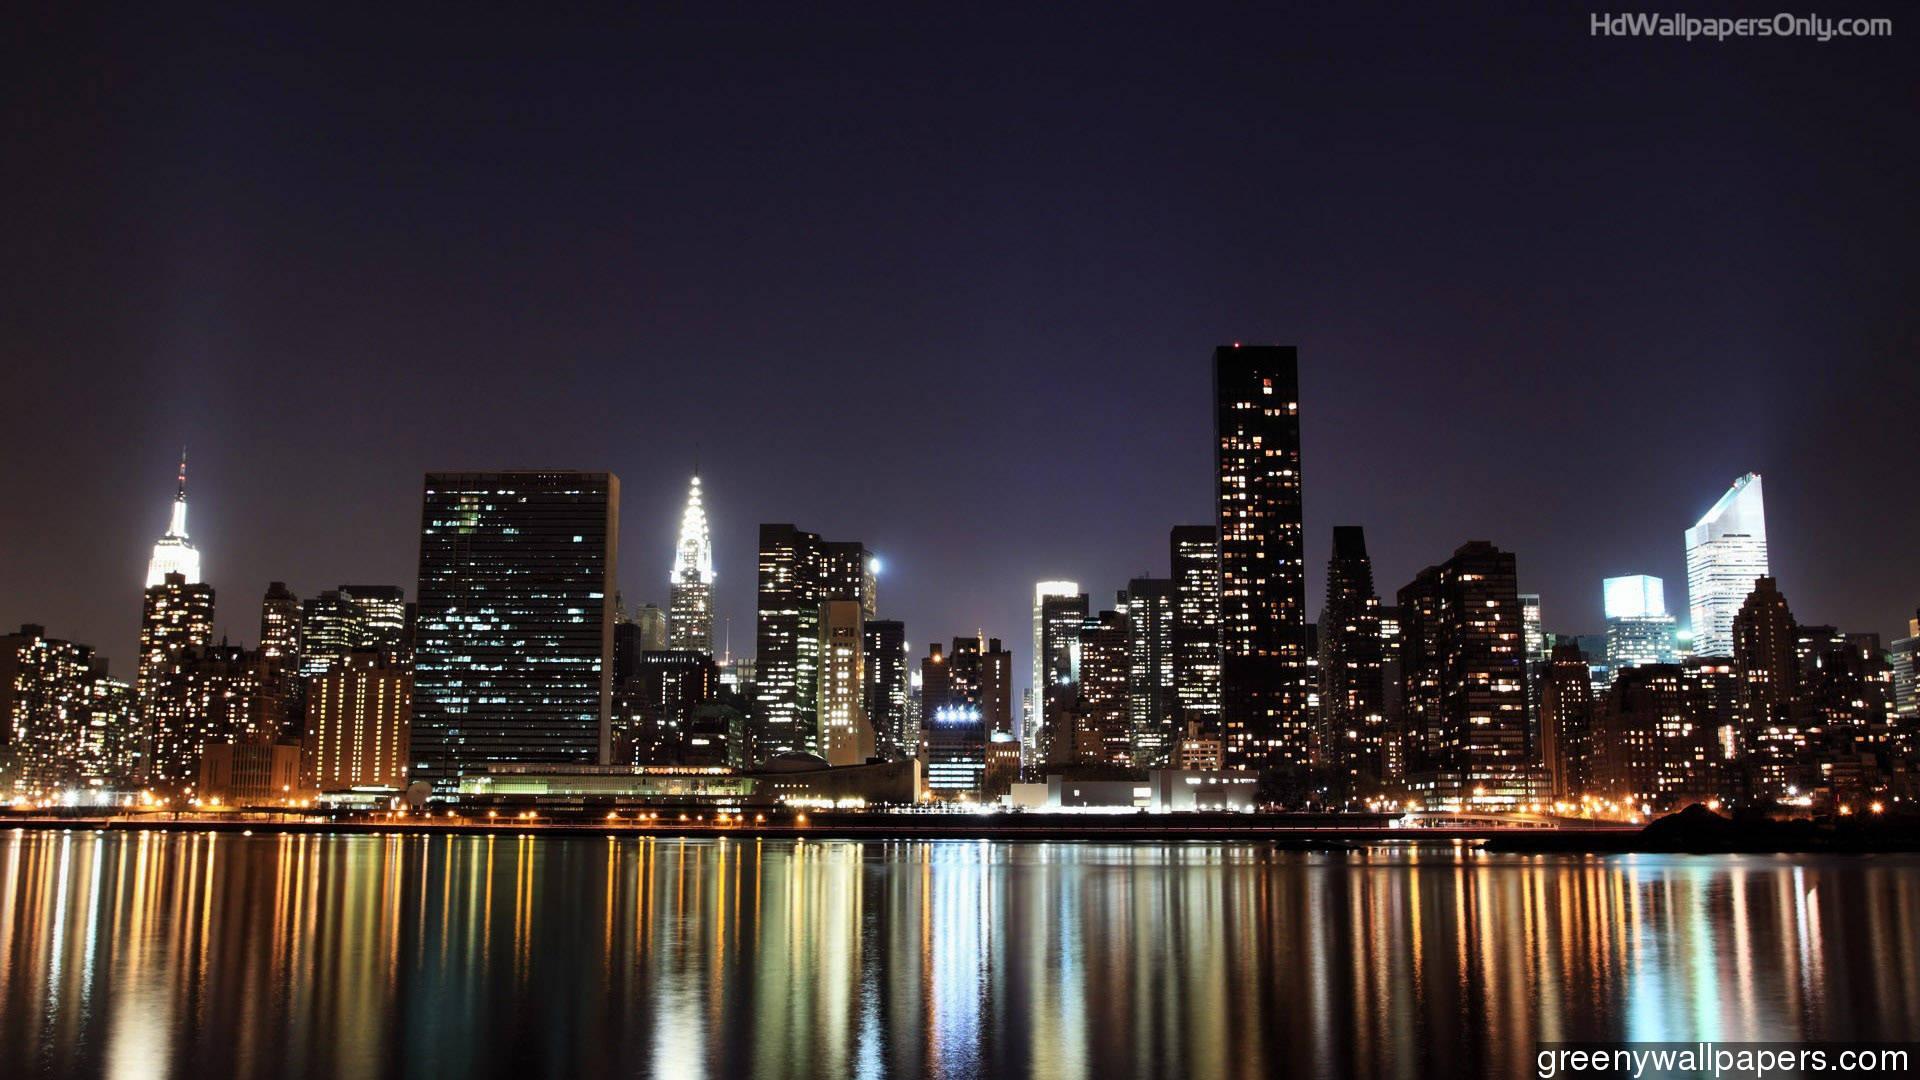 Skyline new york city wallpaper wallpaper free download 1920x1080 voltagebd Gallery